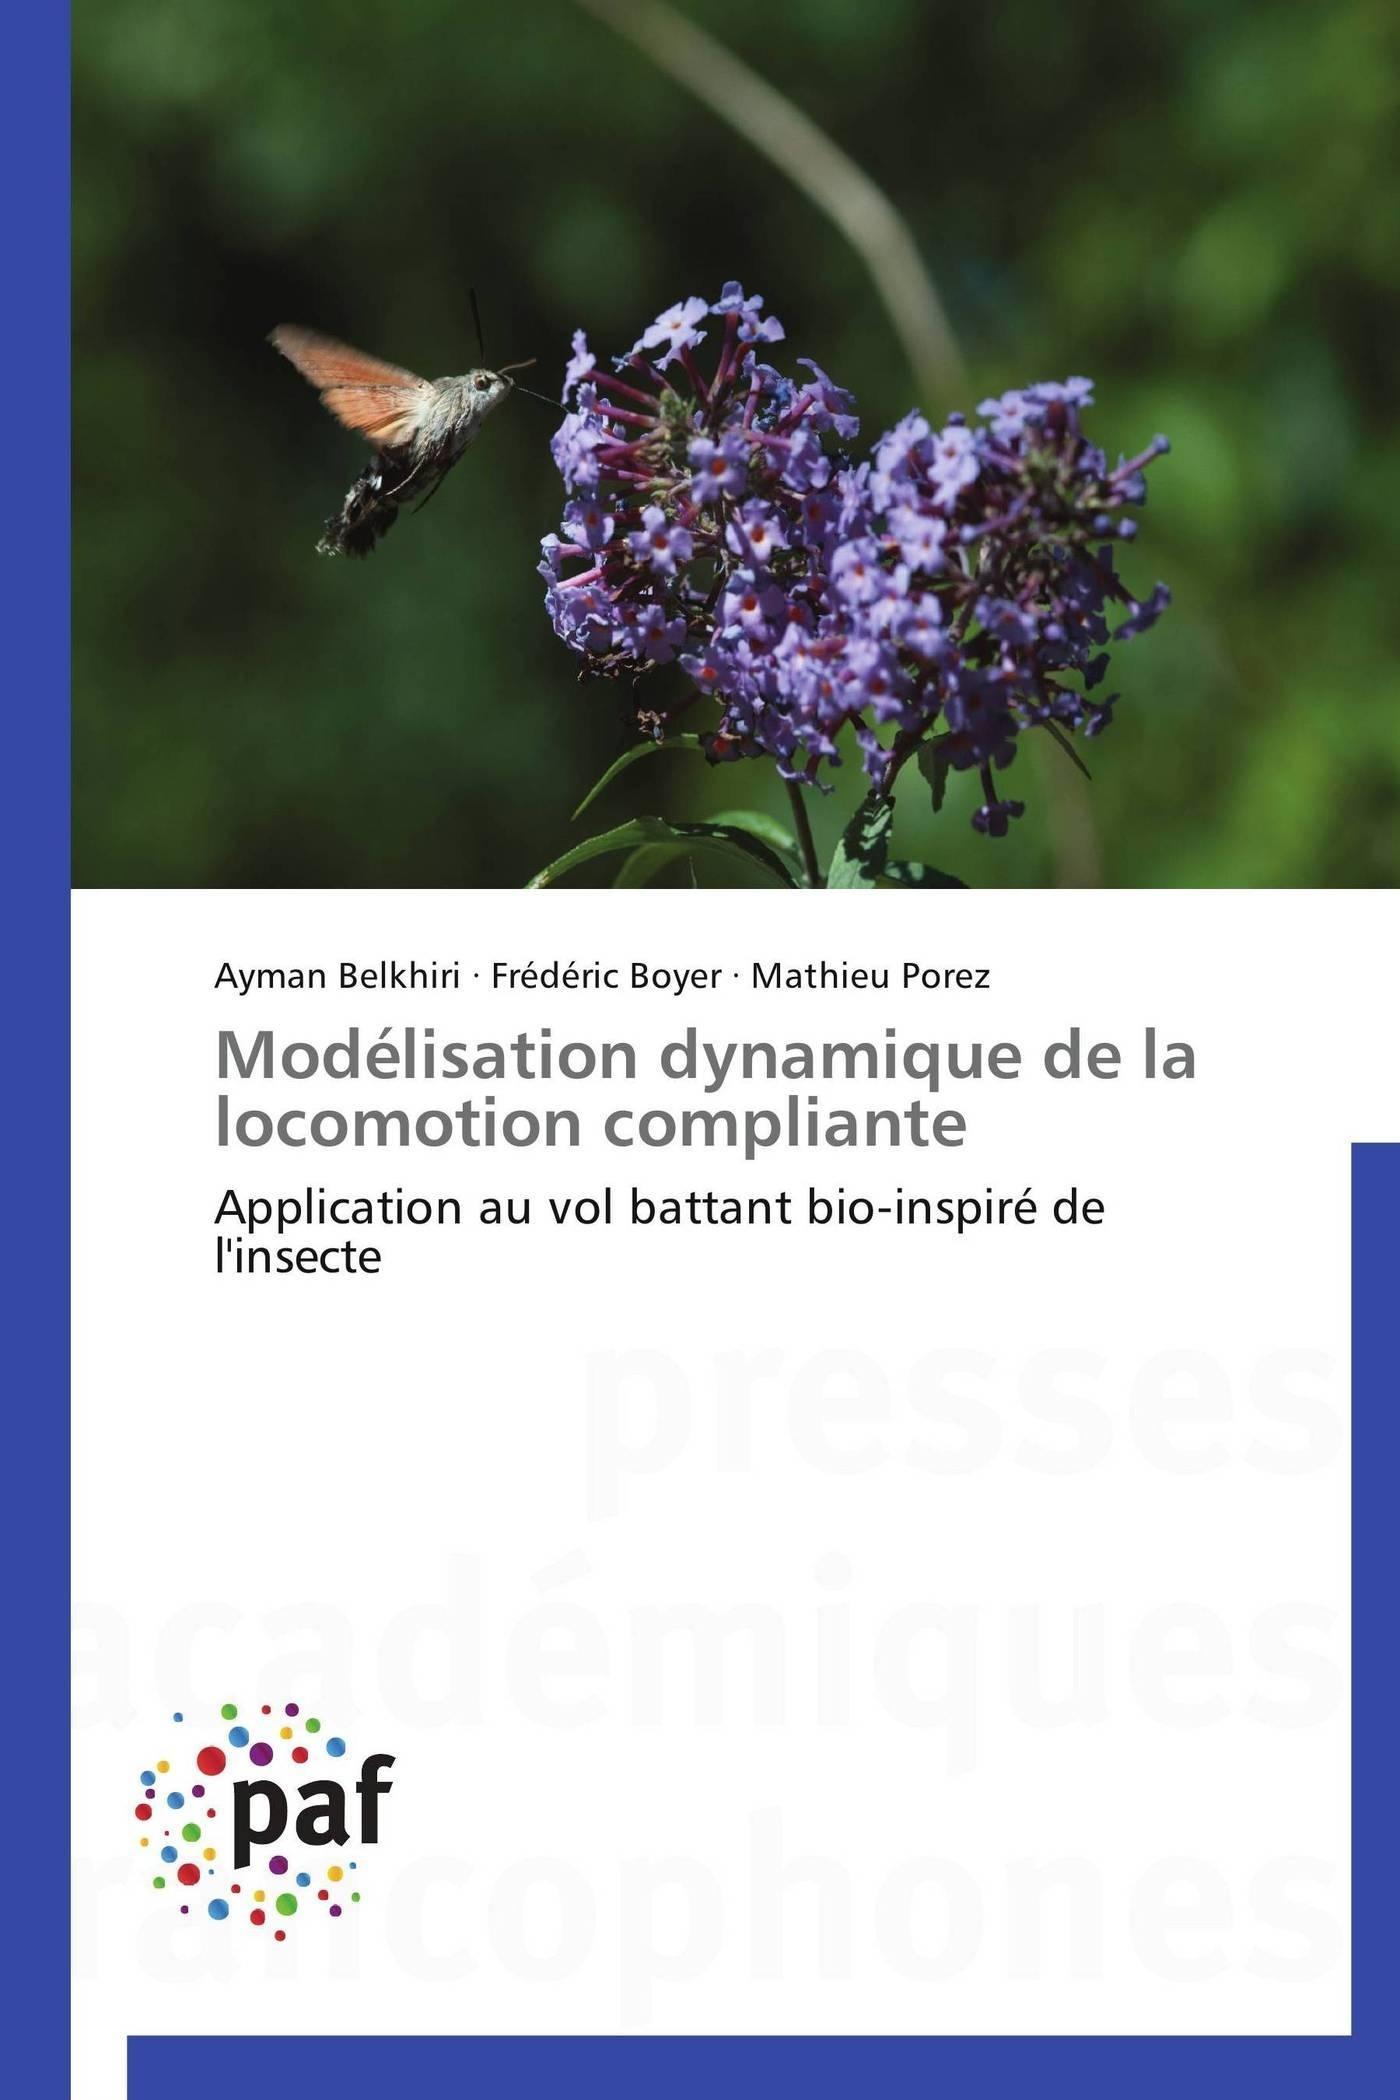 MODELISATION DYNAMIQUE DE LA LOCOMOTION COMPLIANTE